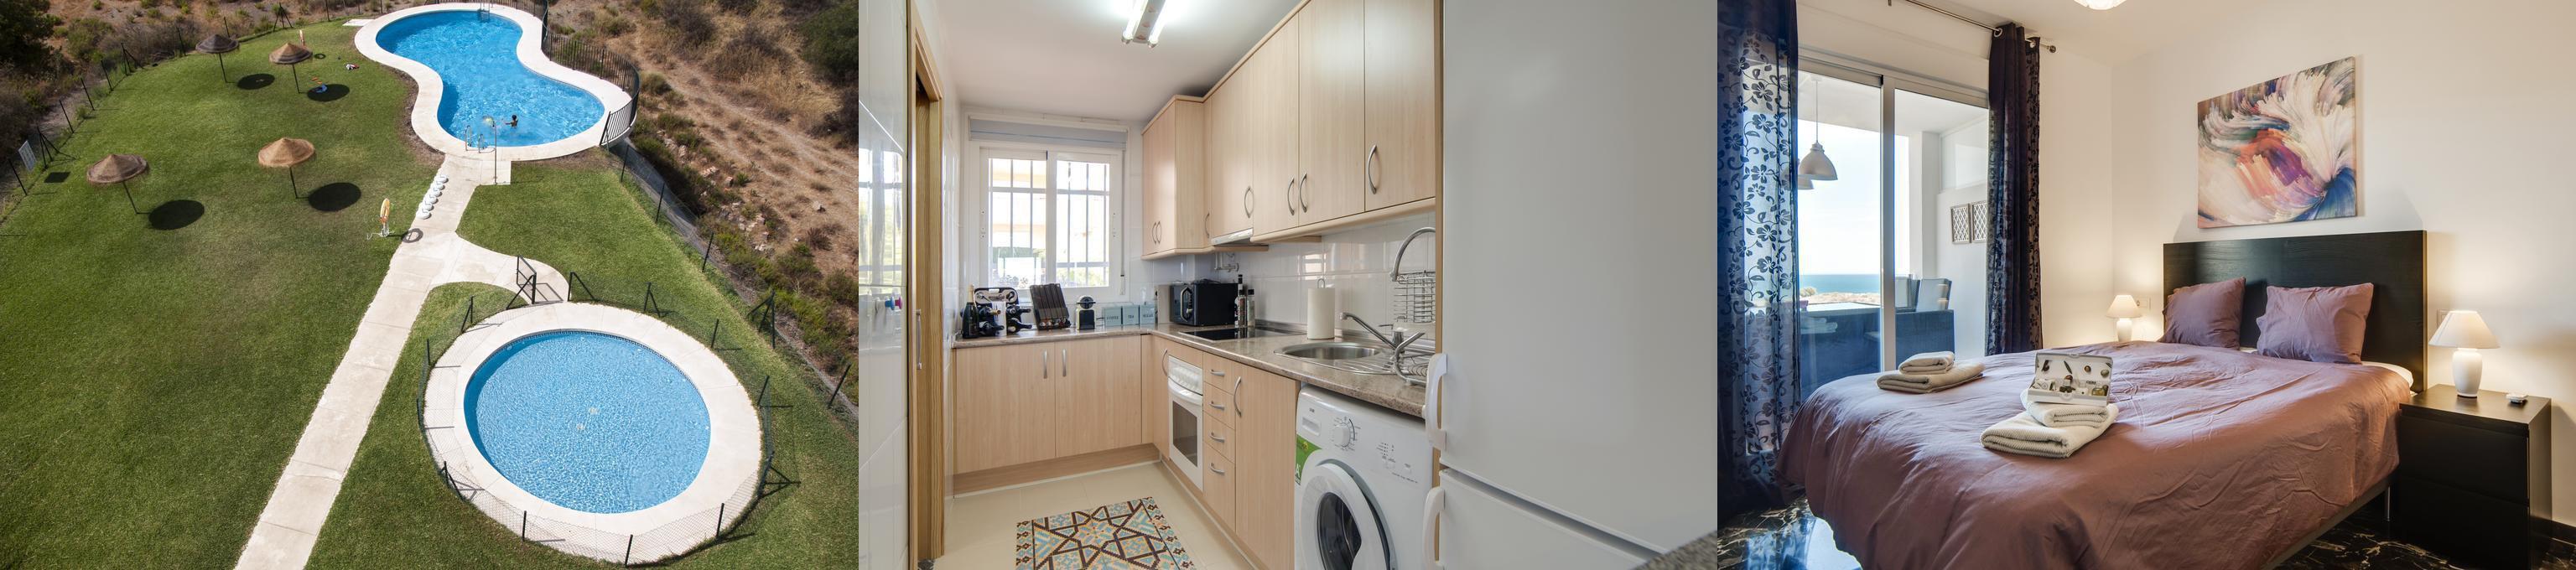 carvajal-luxury-apartments